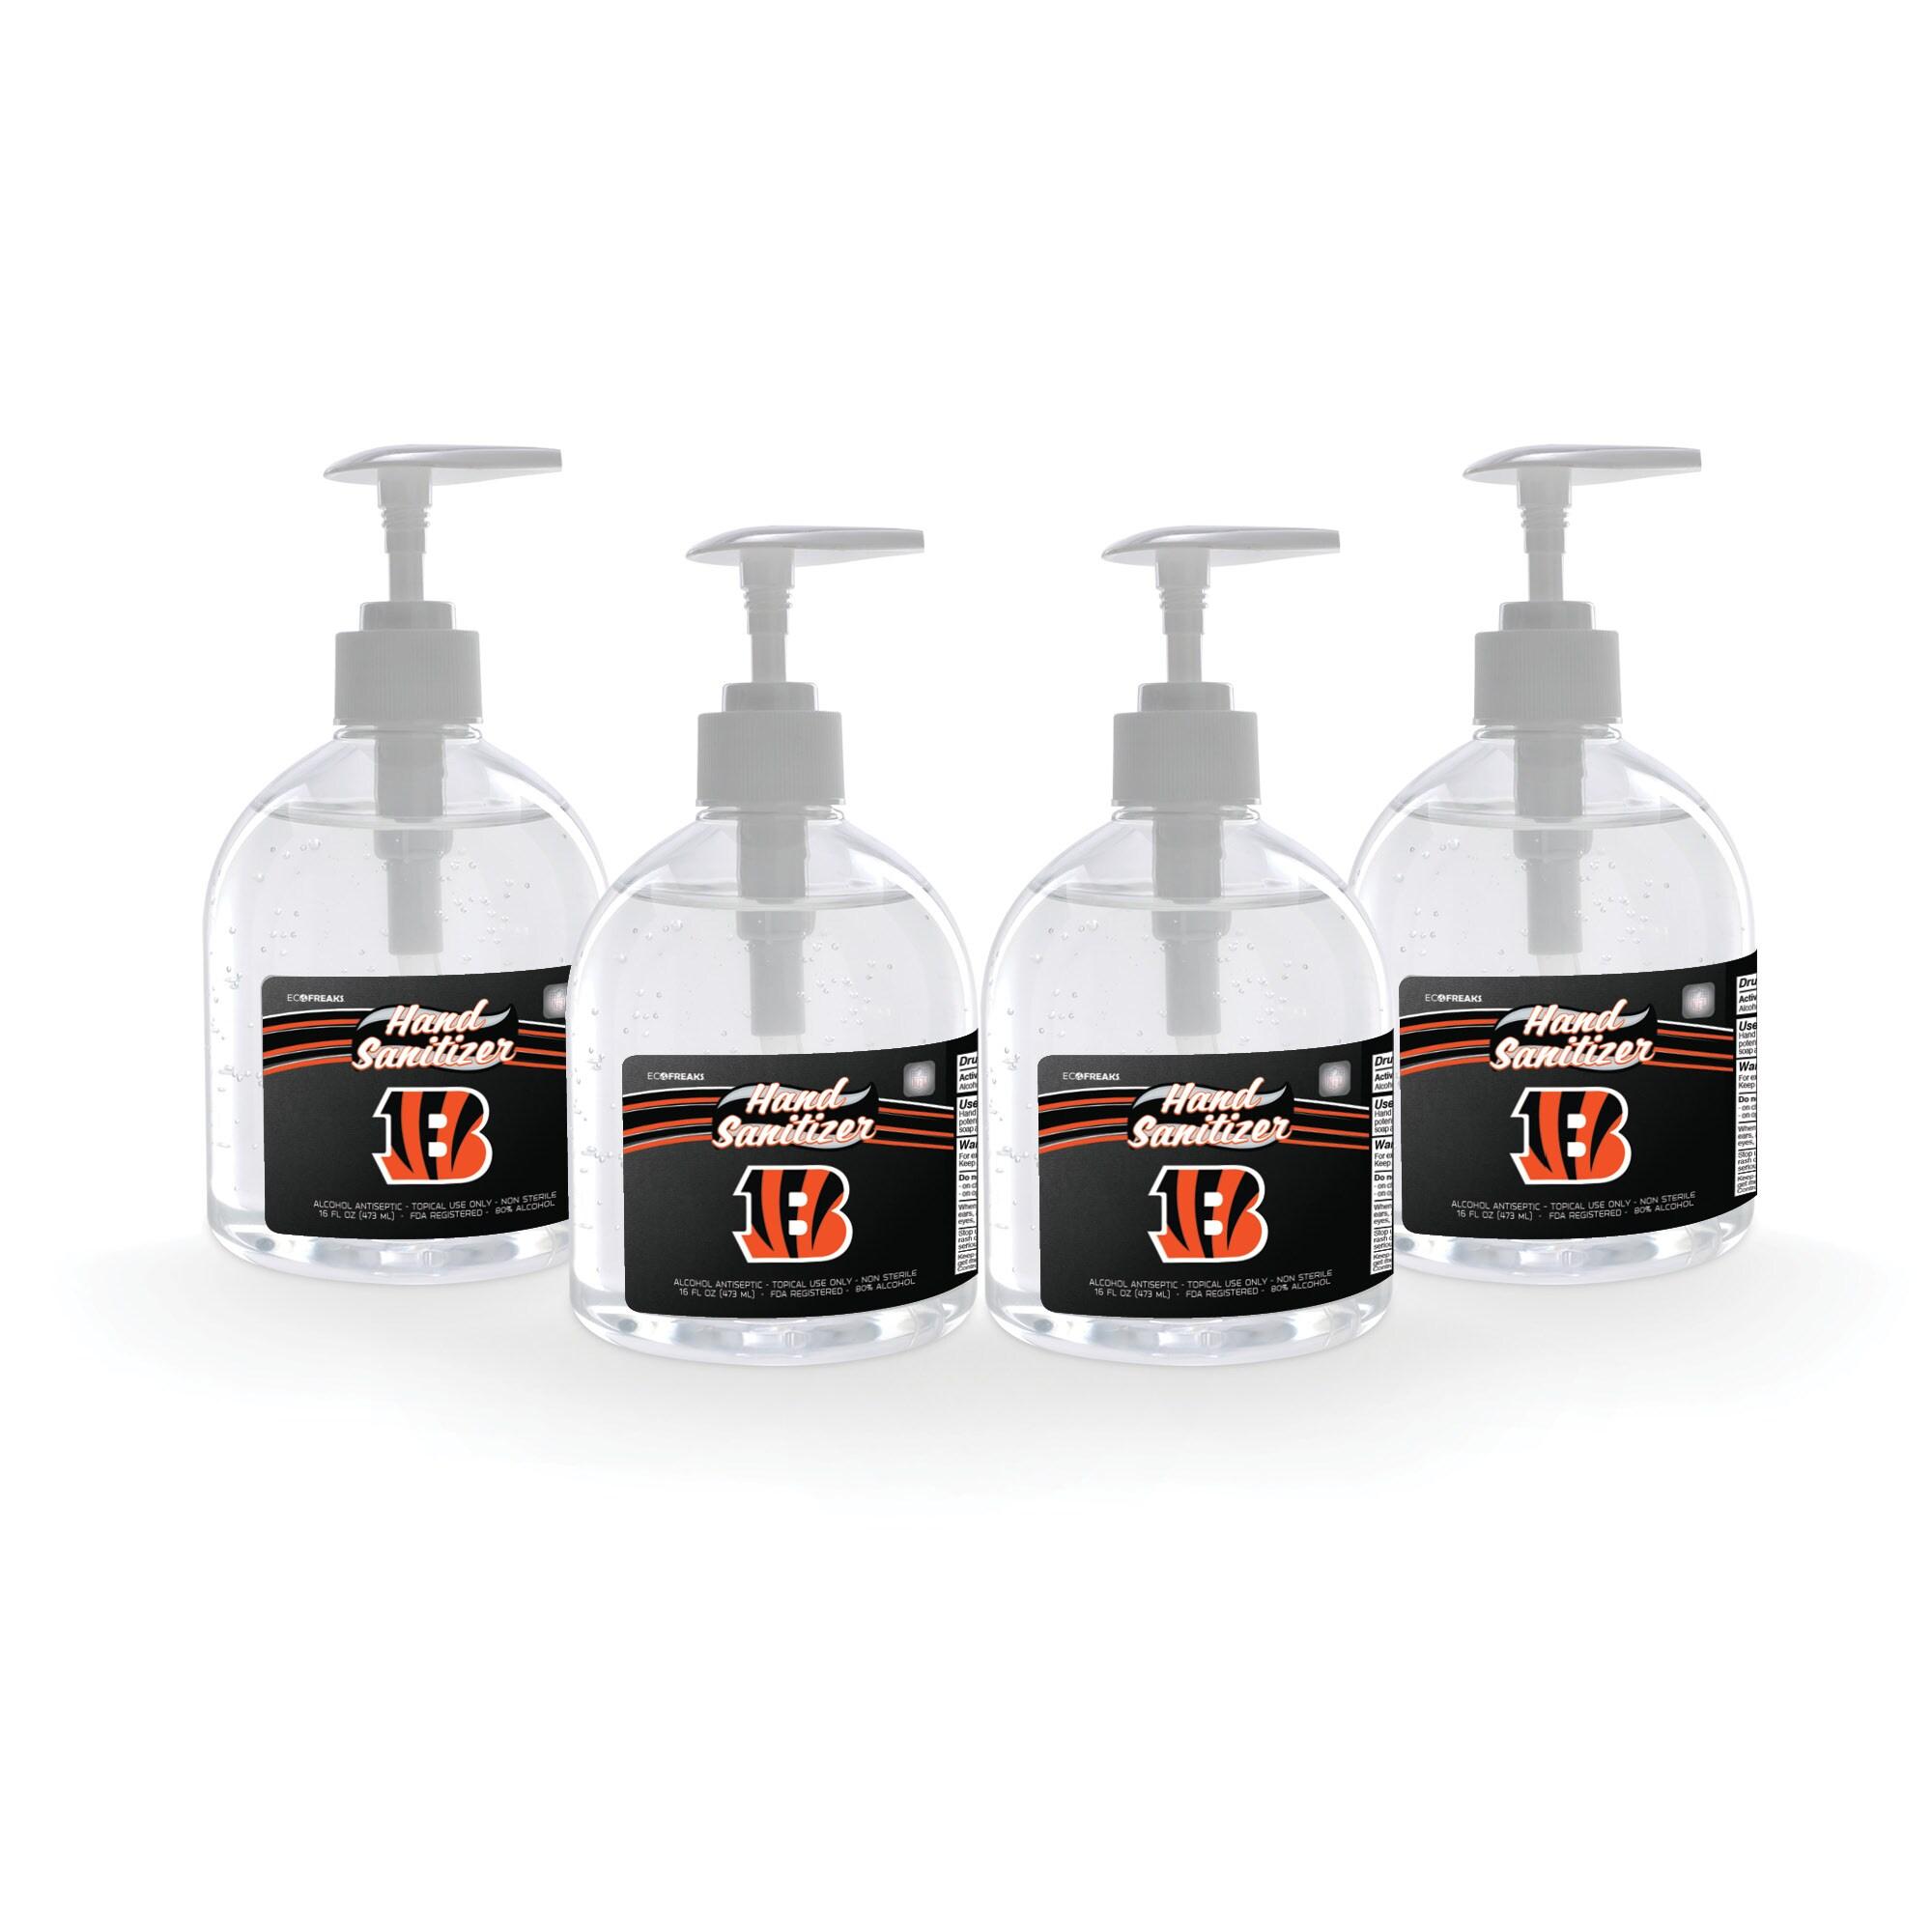 Cincinnati Bengals 16oz. Hand Sanitizer 4-Pack